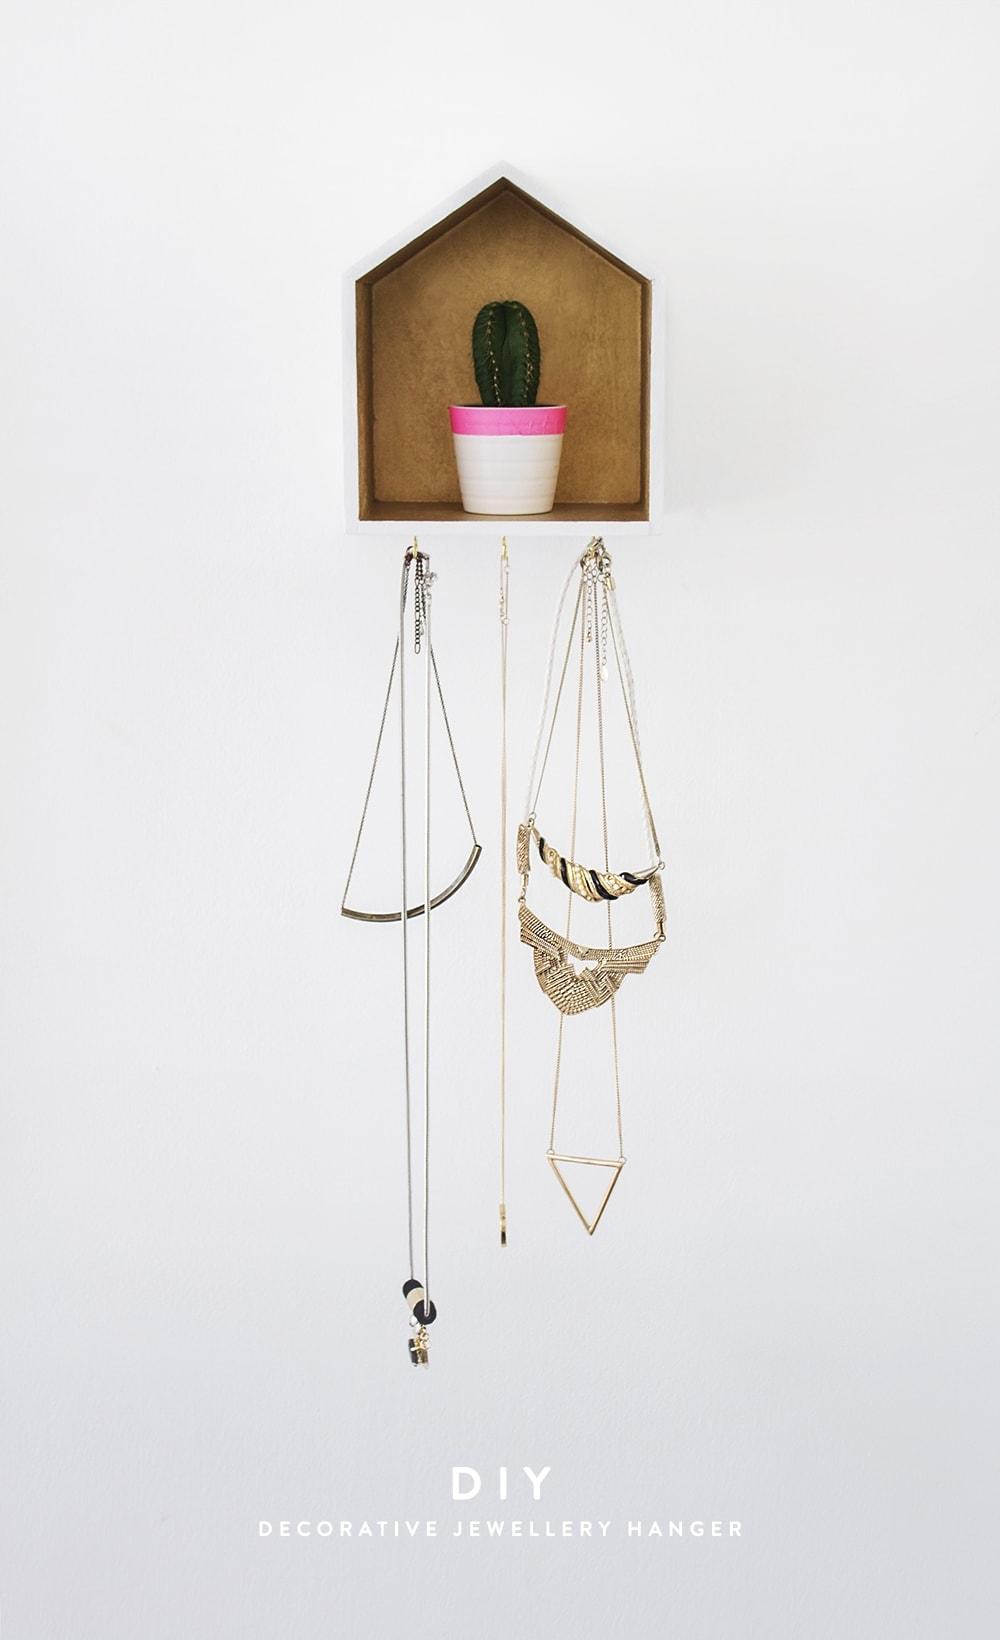 DIY decorative jewellery hanger 1